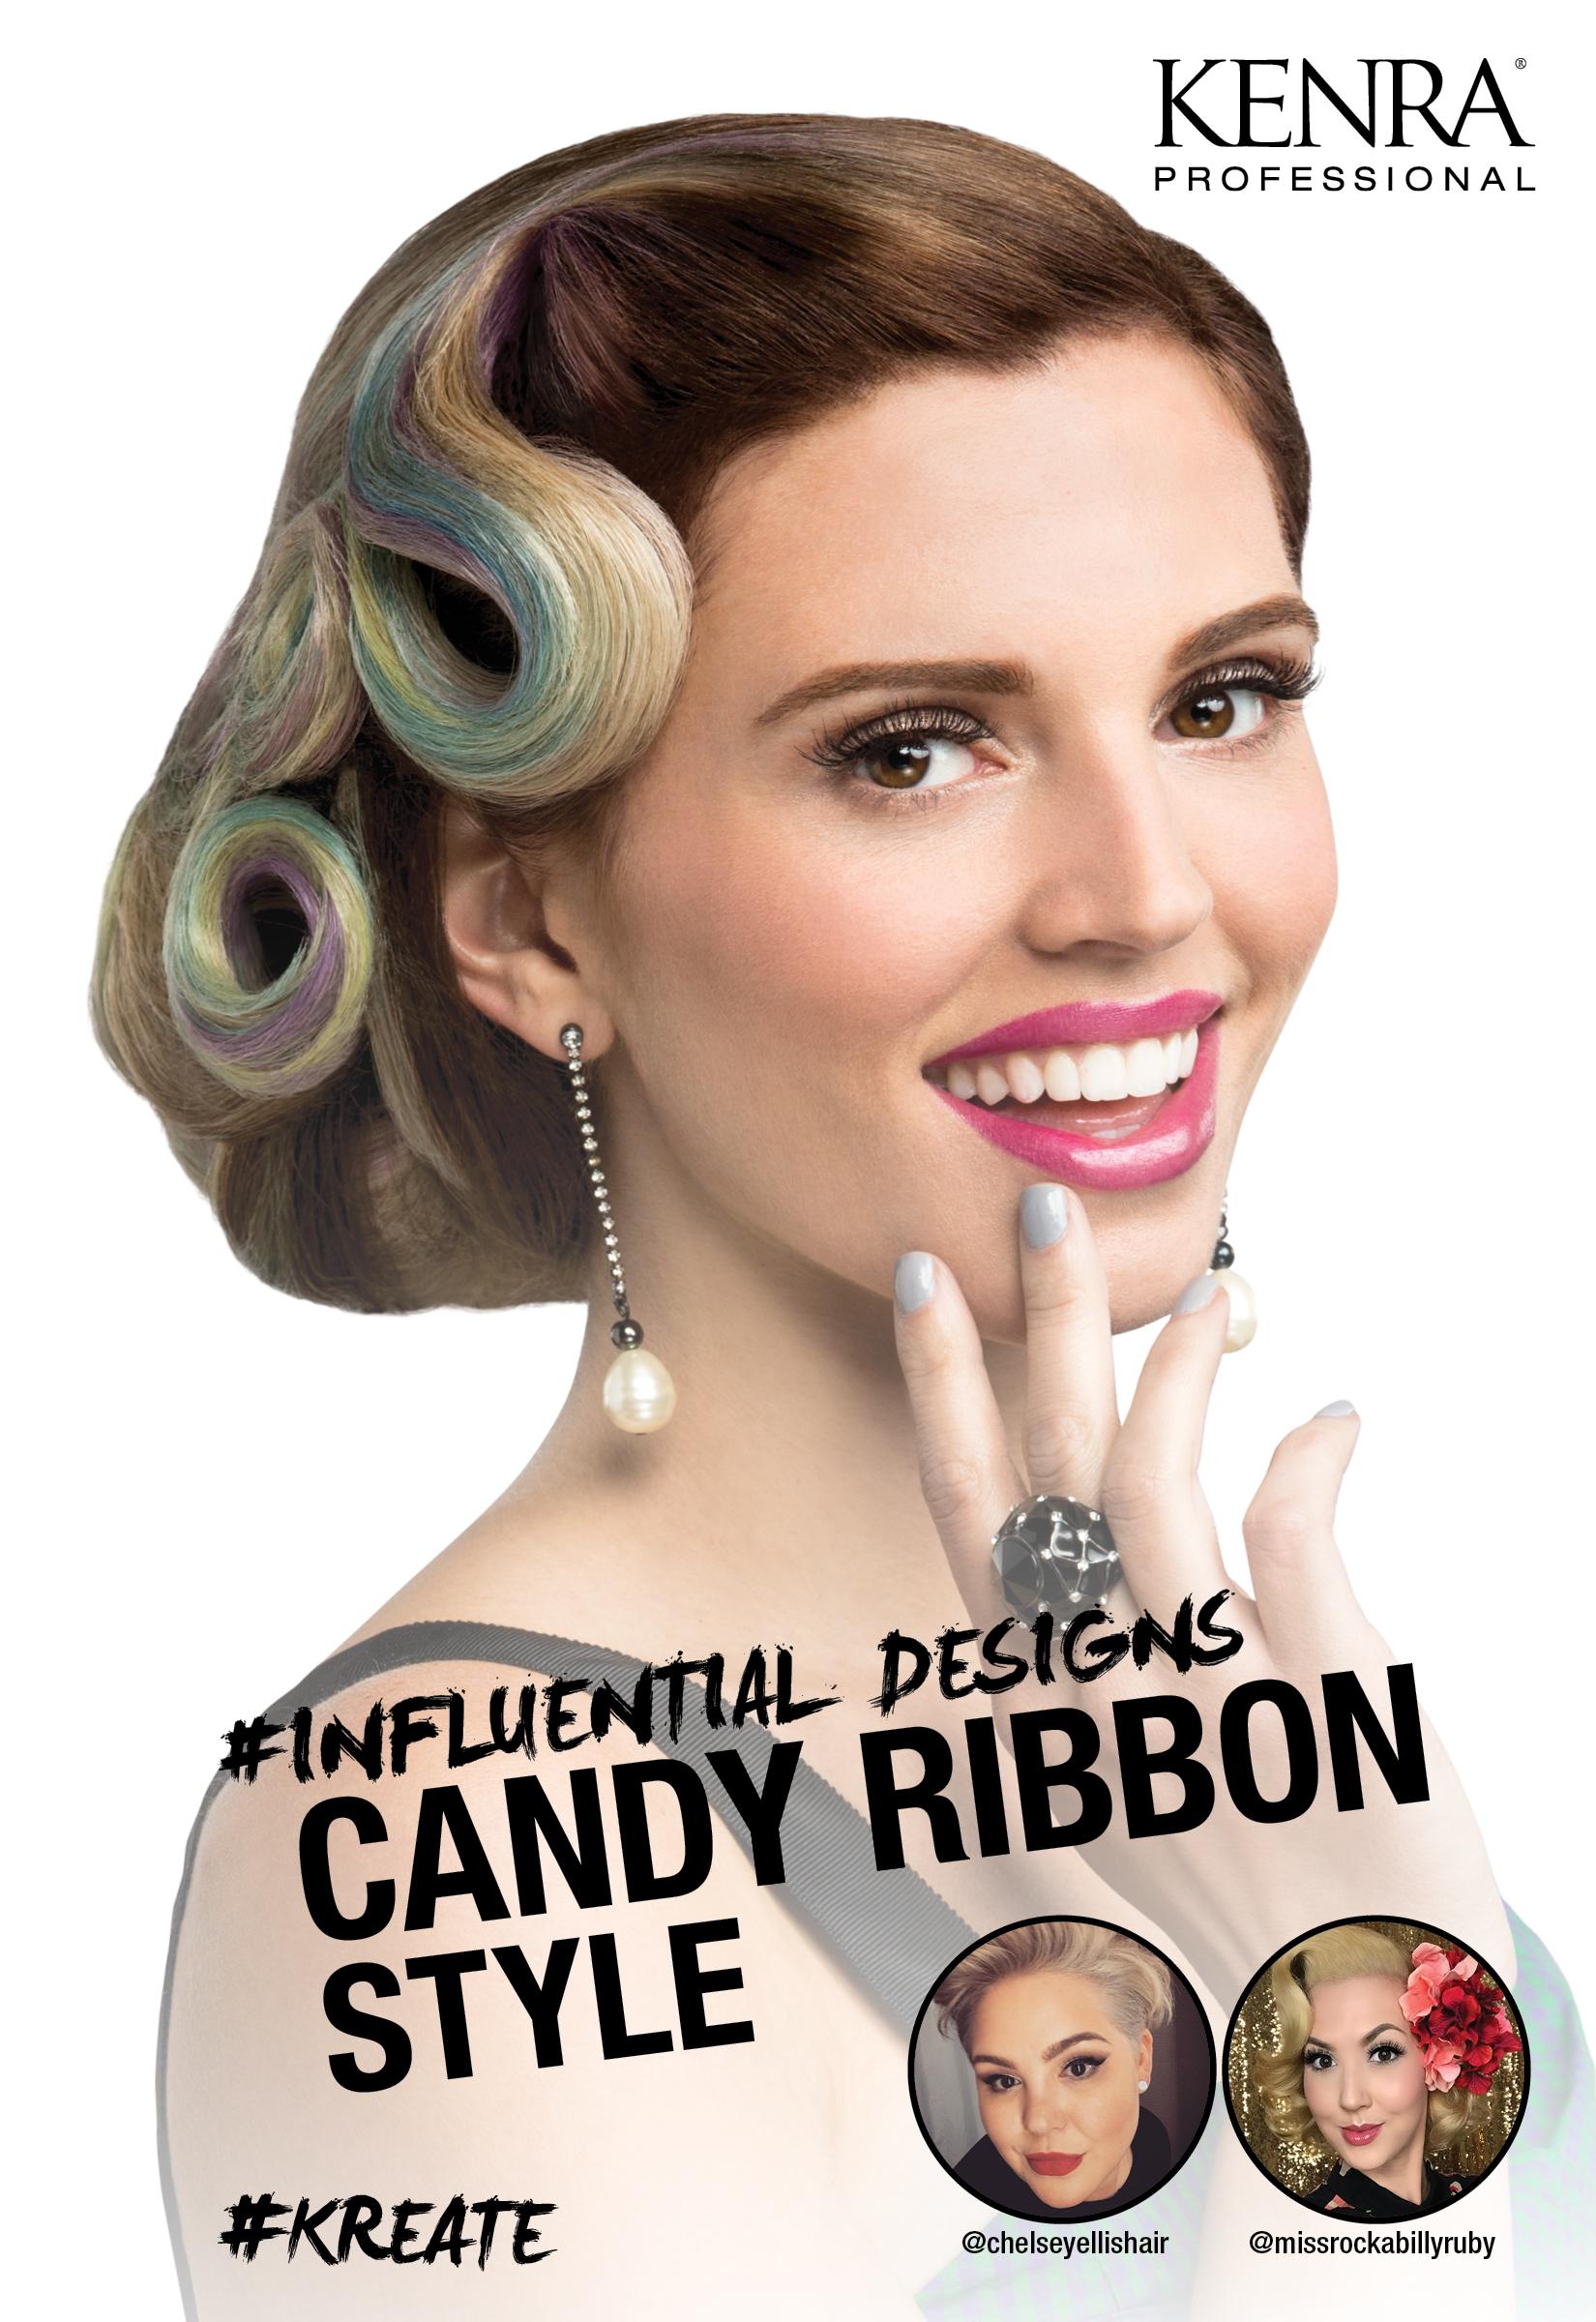 00000ID_CandyRibbon_Style.jpg